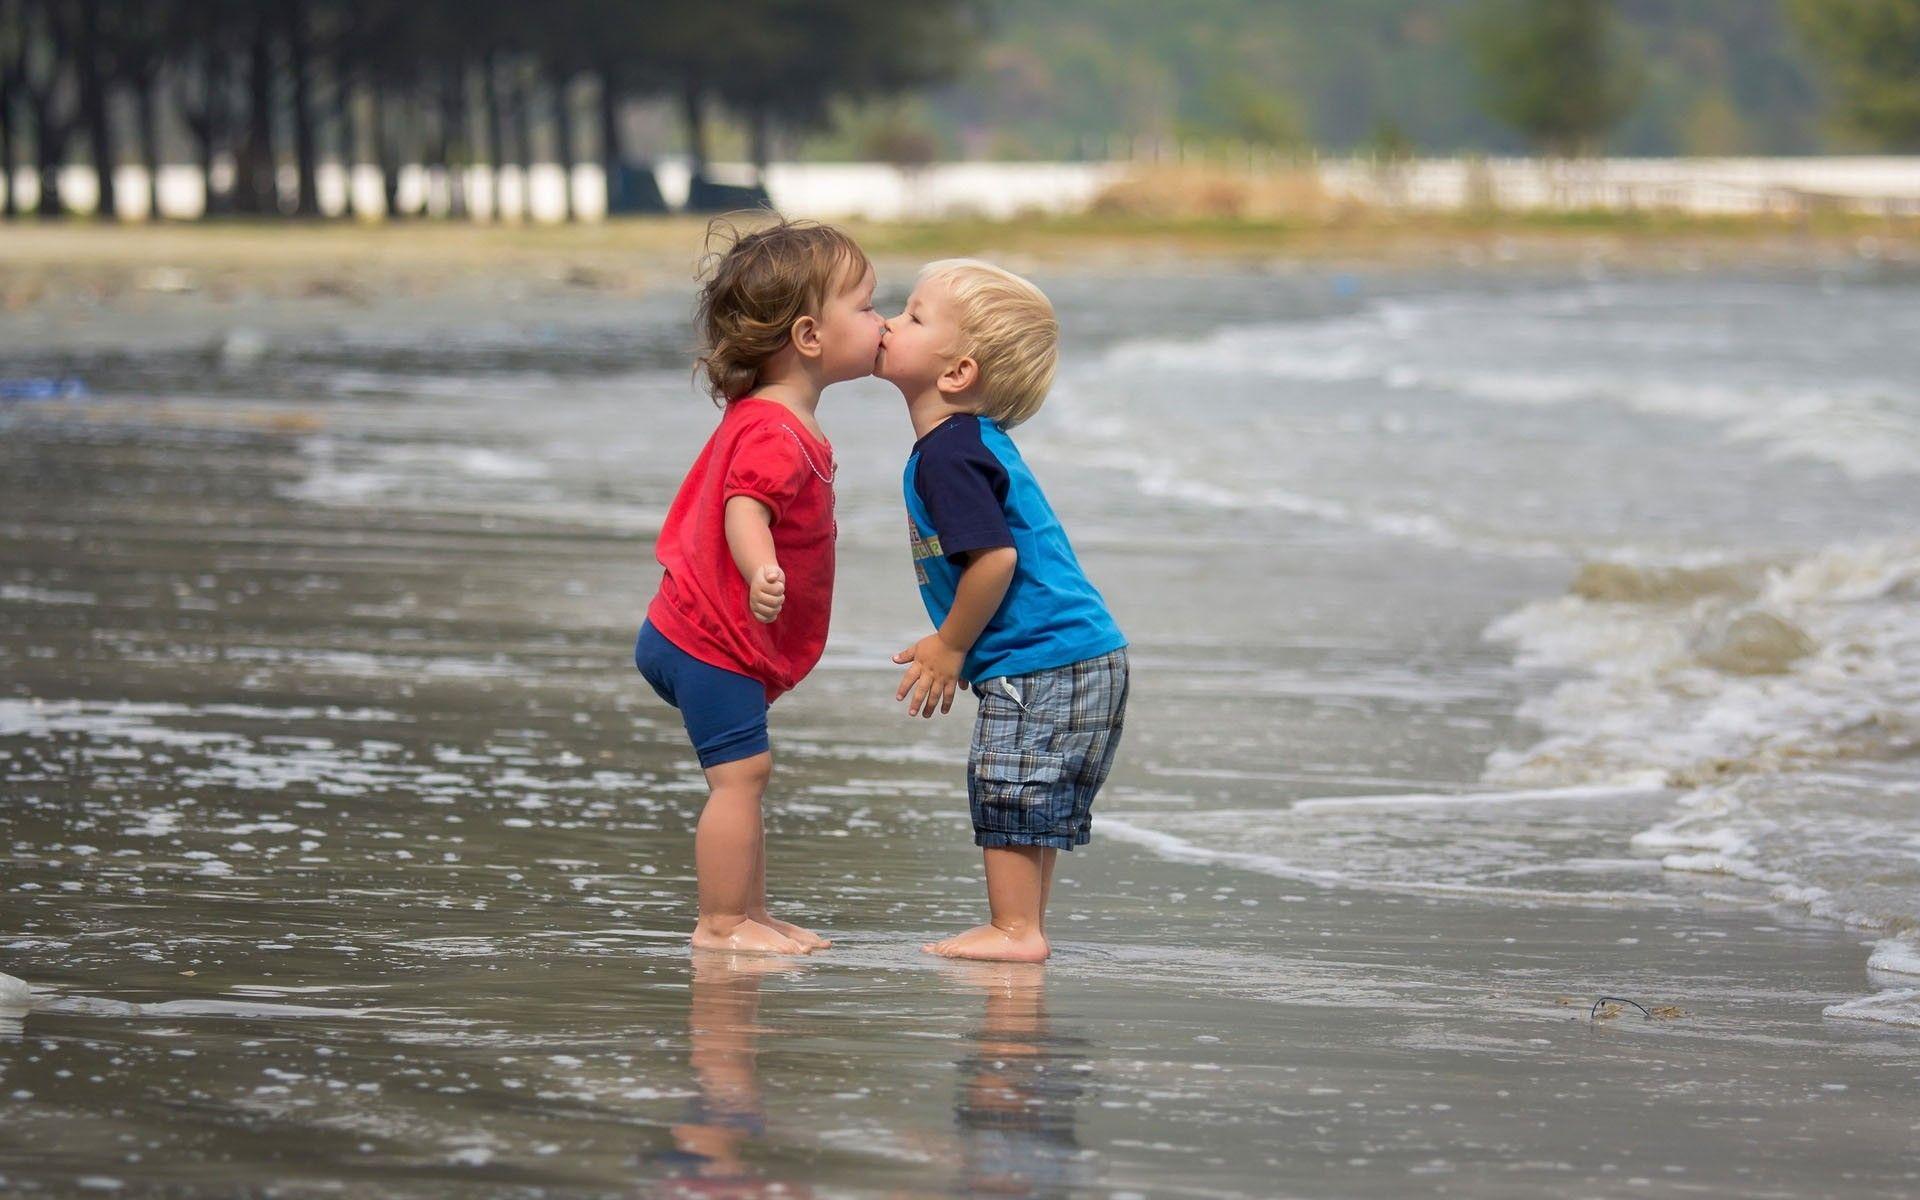 Pin By Sajan Singh On Nalla Pinterest Cute Kiss Kiss And Children